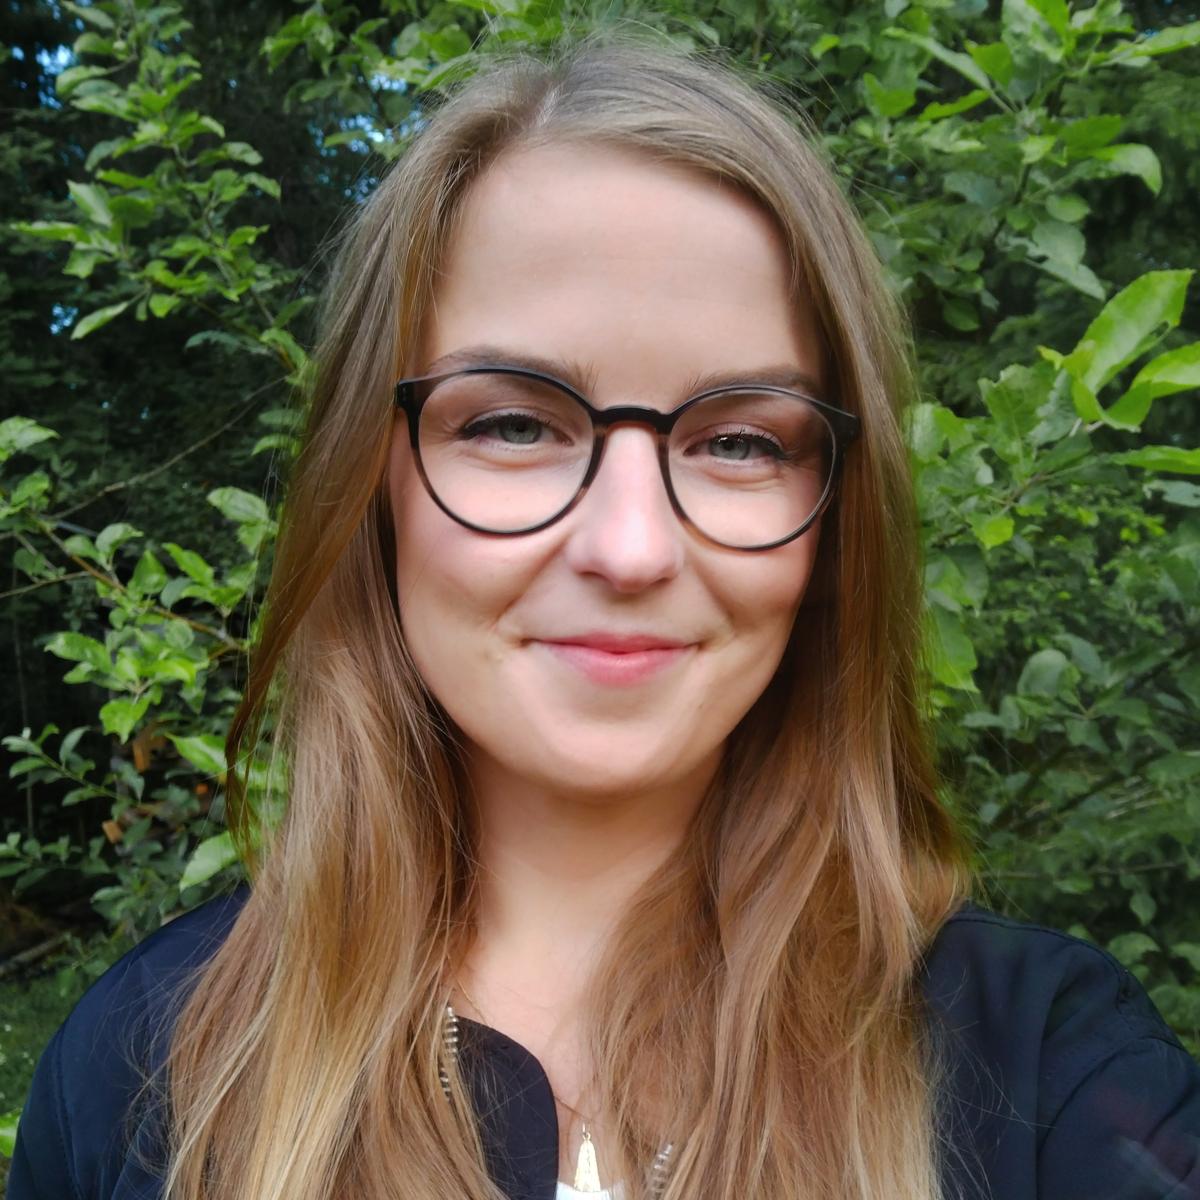 Irma Pettersson